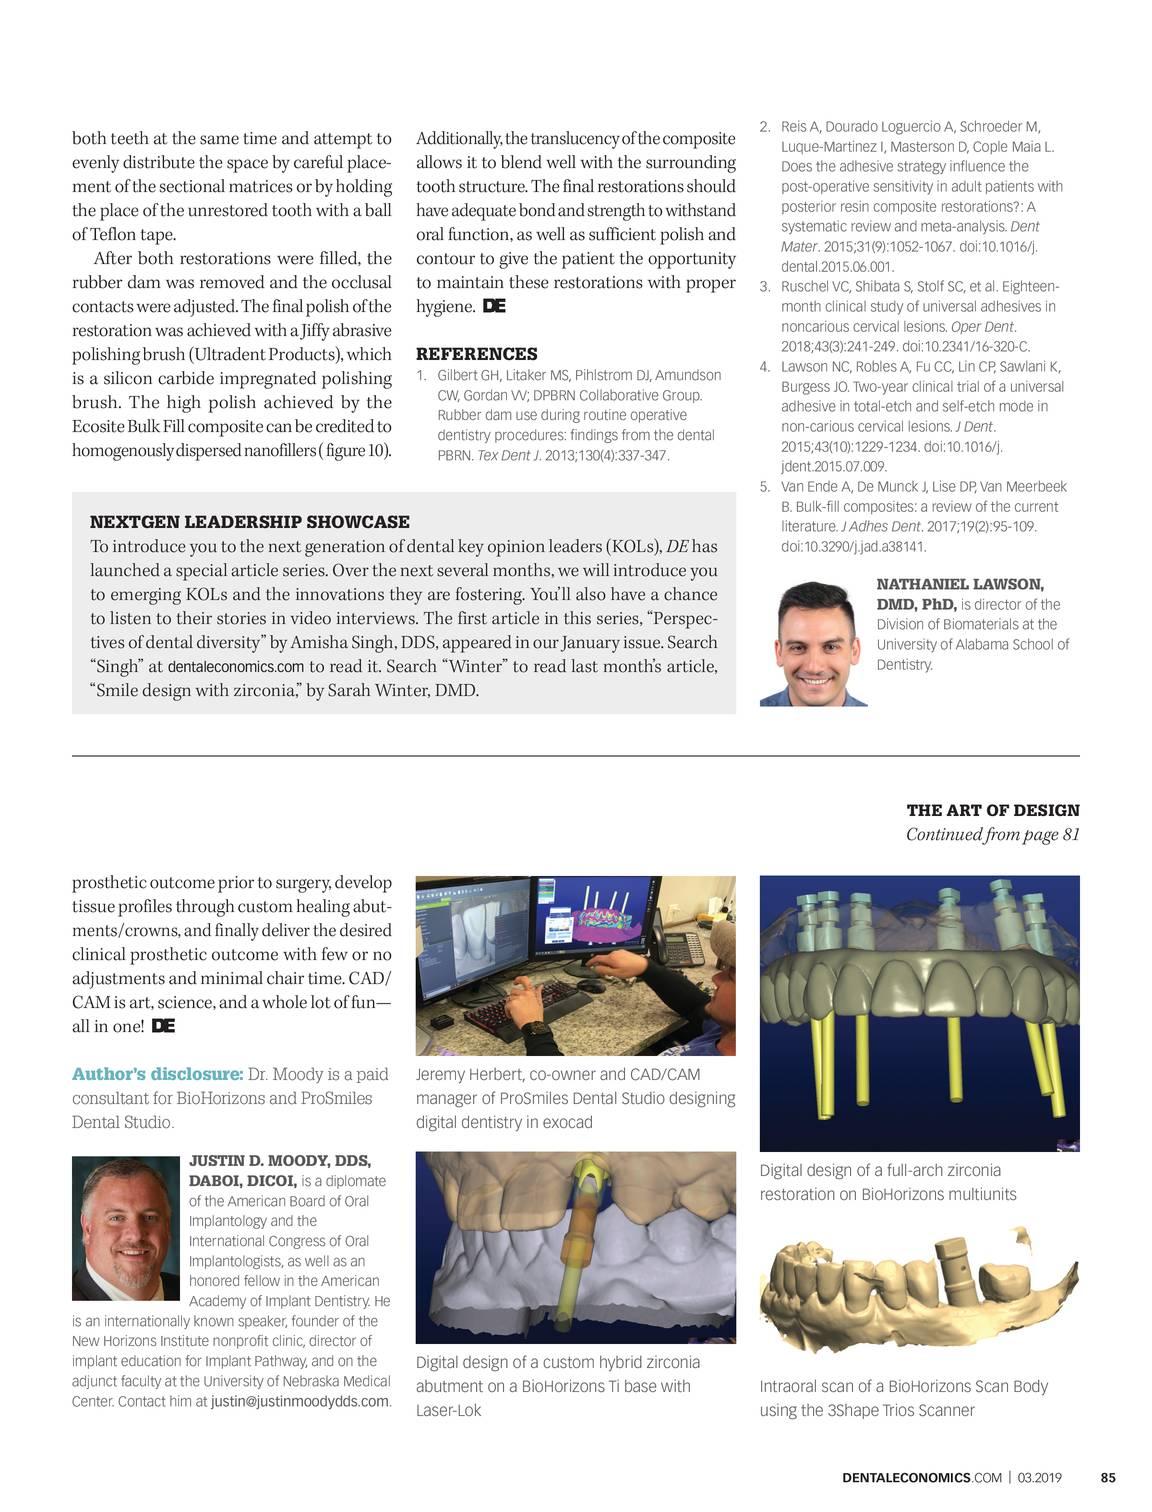 Dental Economics - March 2019 - page 86